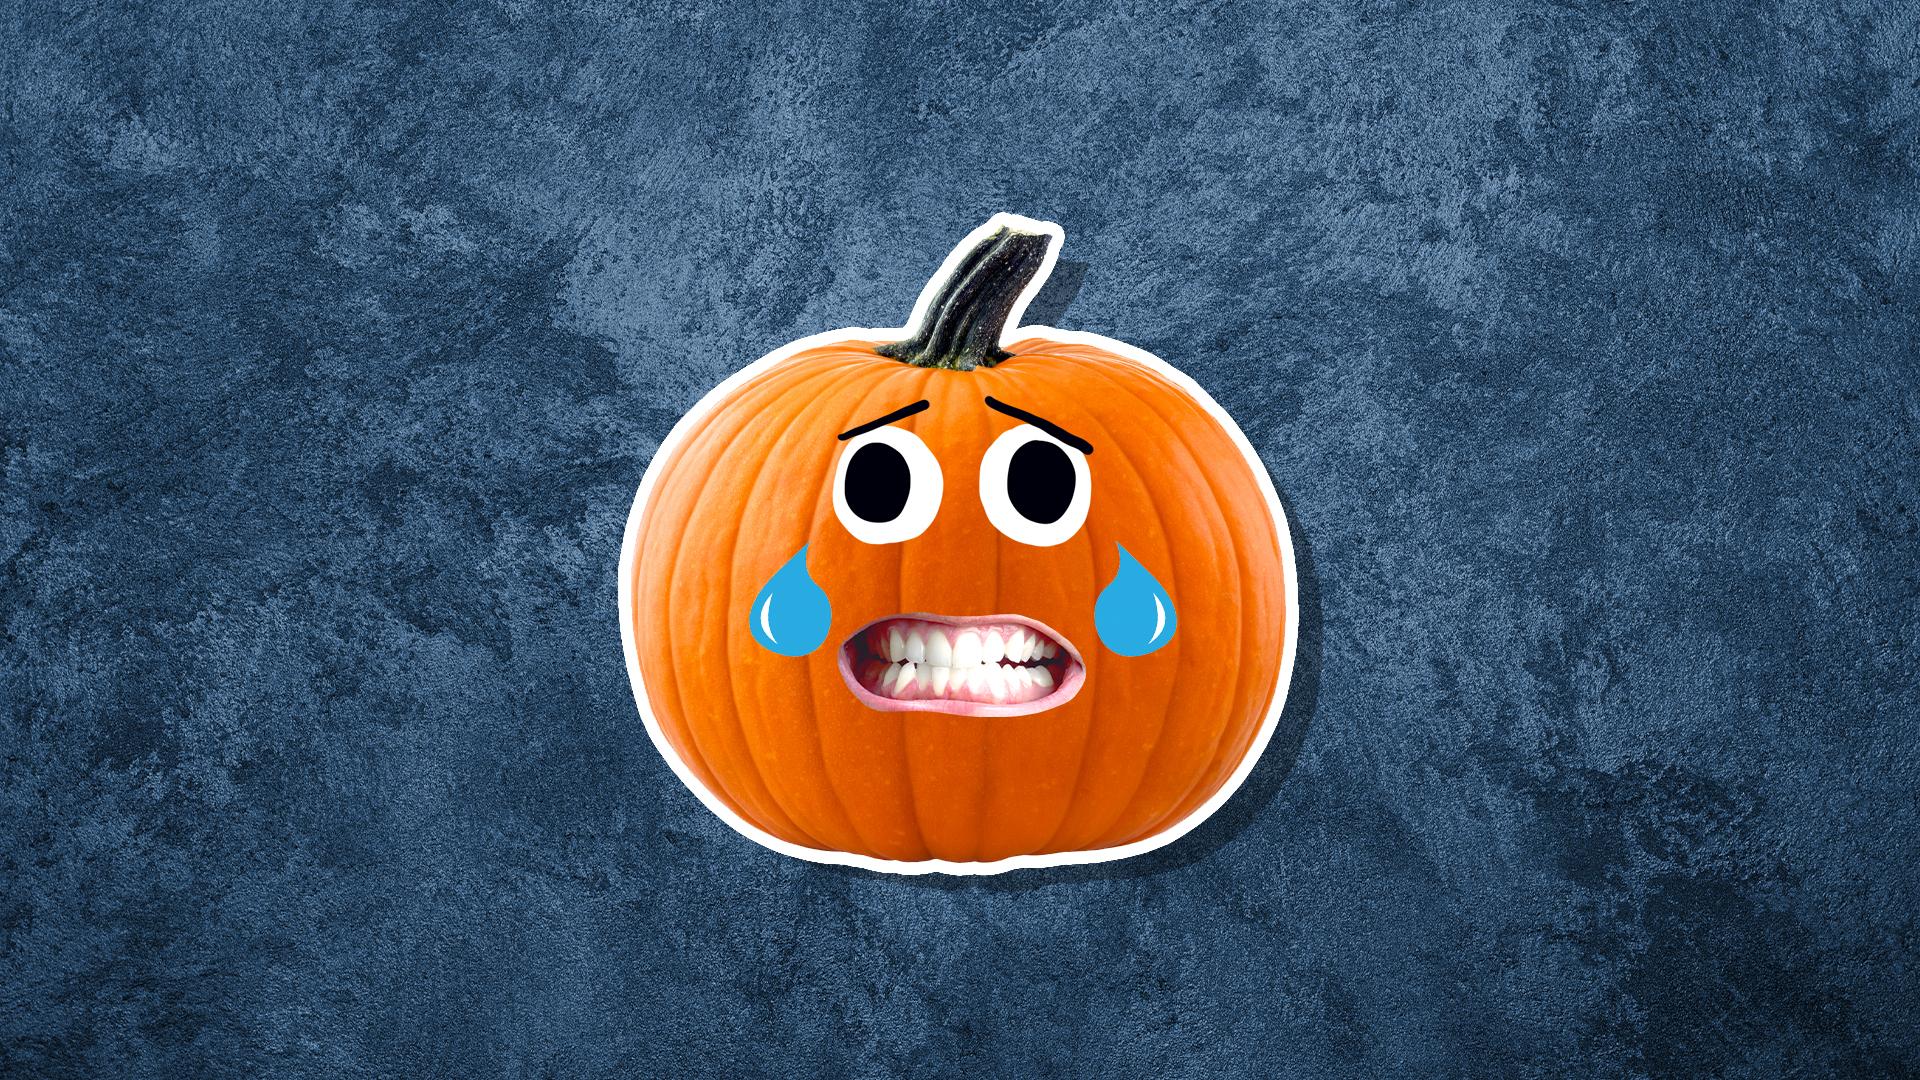 A cry laughing pumpkin